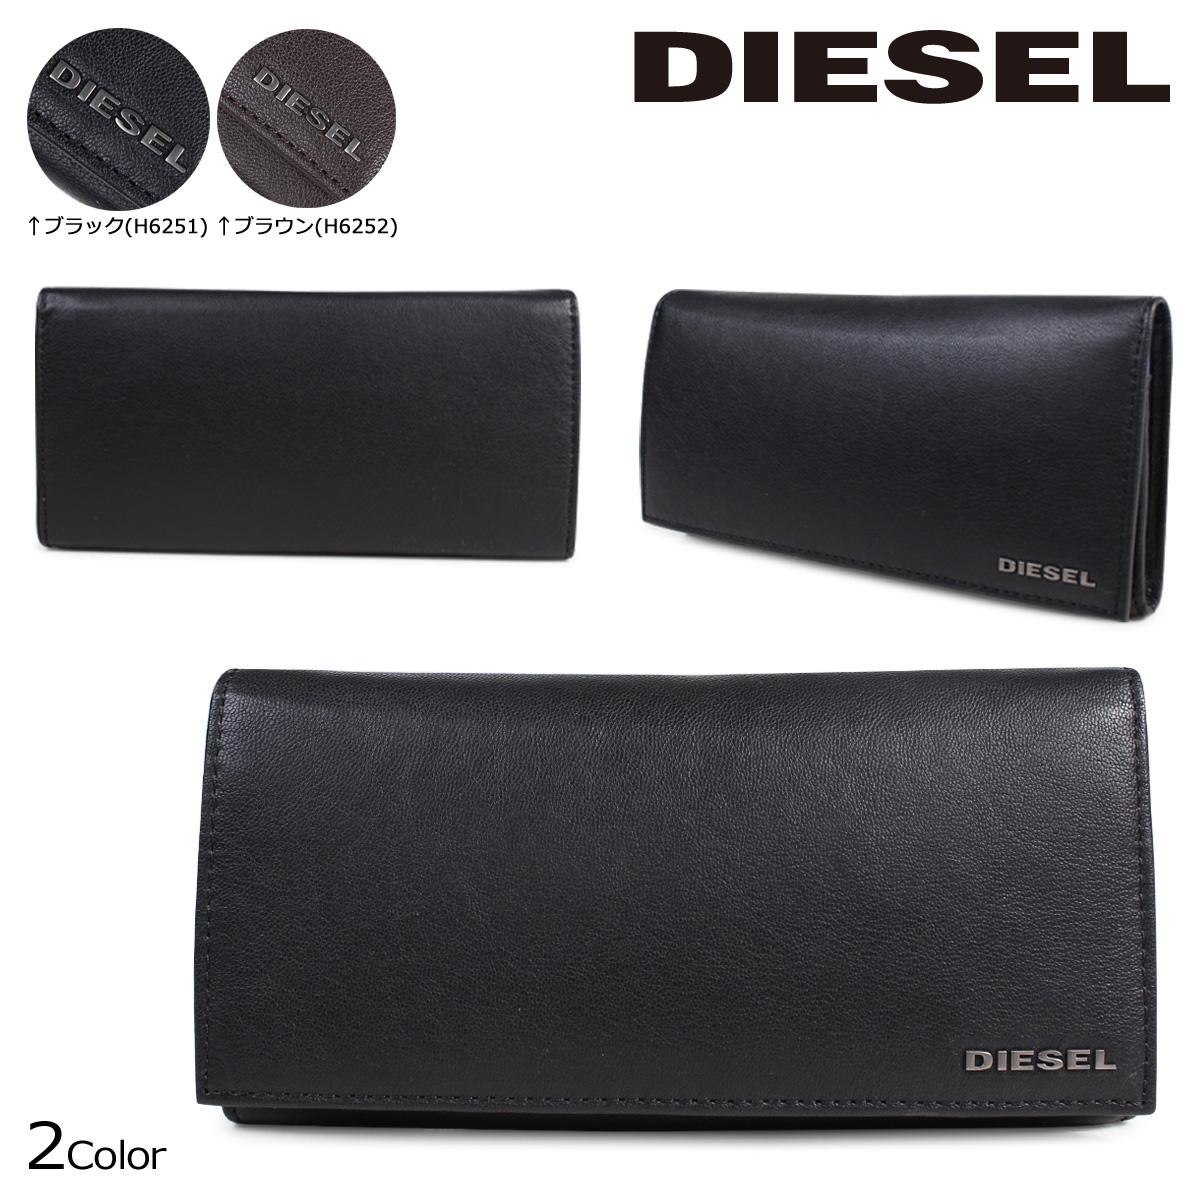 DIESEL 24 A DAY 財布 メンズ ディーゼル 長財布 X04457 PR013 2カラー 【決算セール 返品不可】